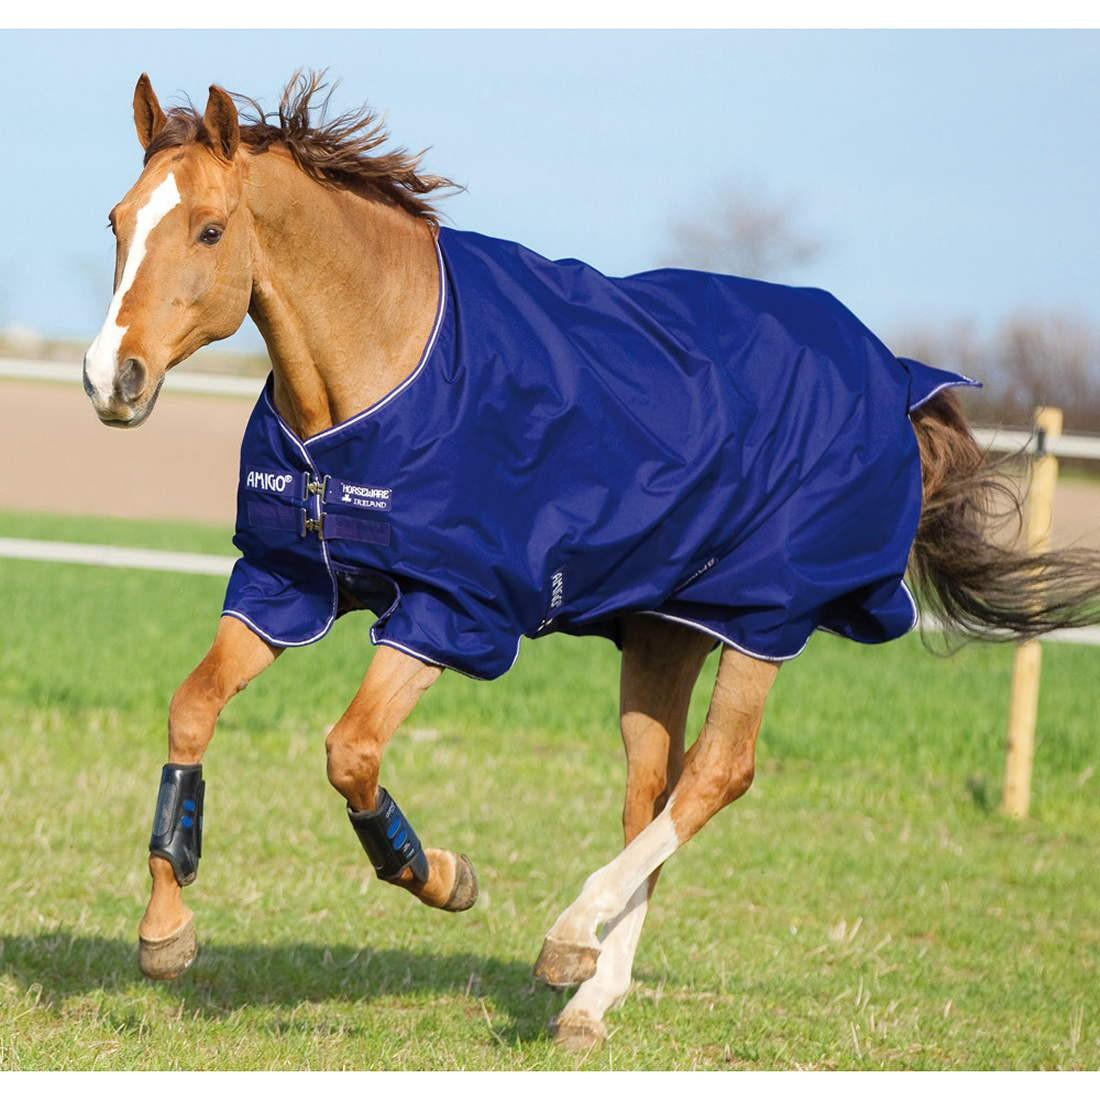 Sentinel Horseware Ireland Amigo Hero 600d Lite Turnout Blanket With Leg Arches